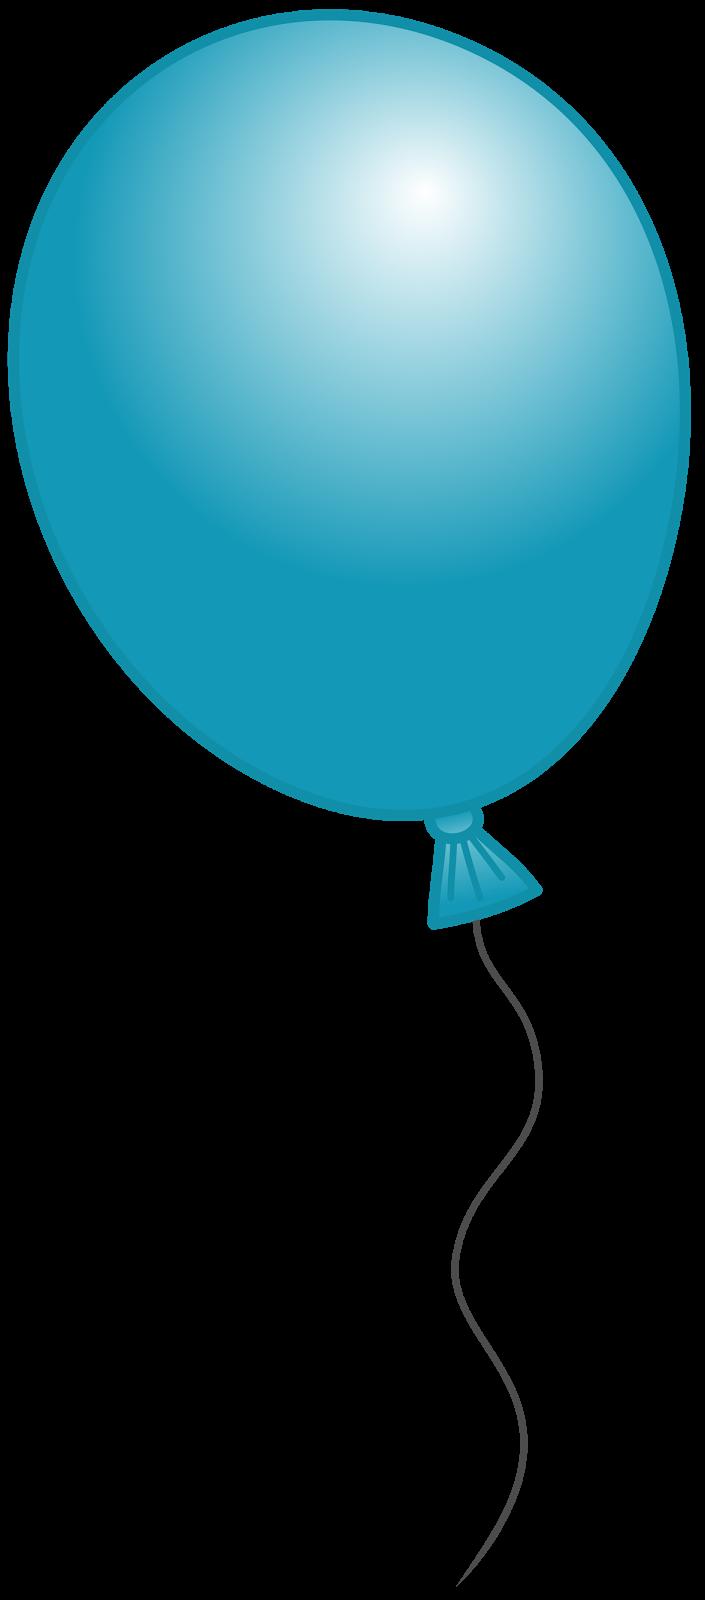 Balloon Clipart: Blue Balloon Clipart-Balloon clipart: Blue Balloon Clipart-3